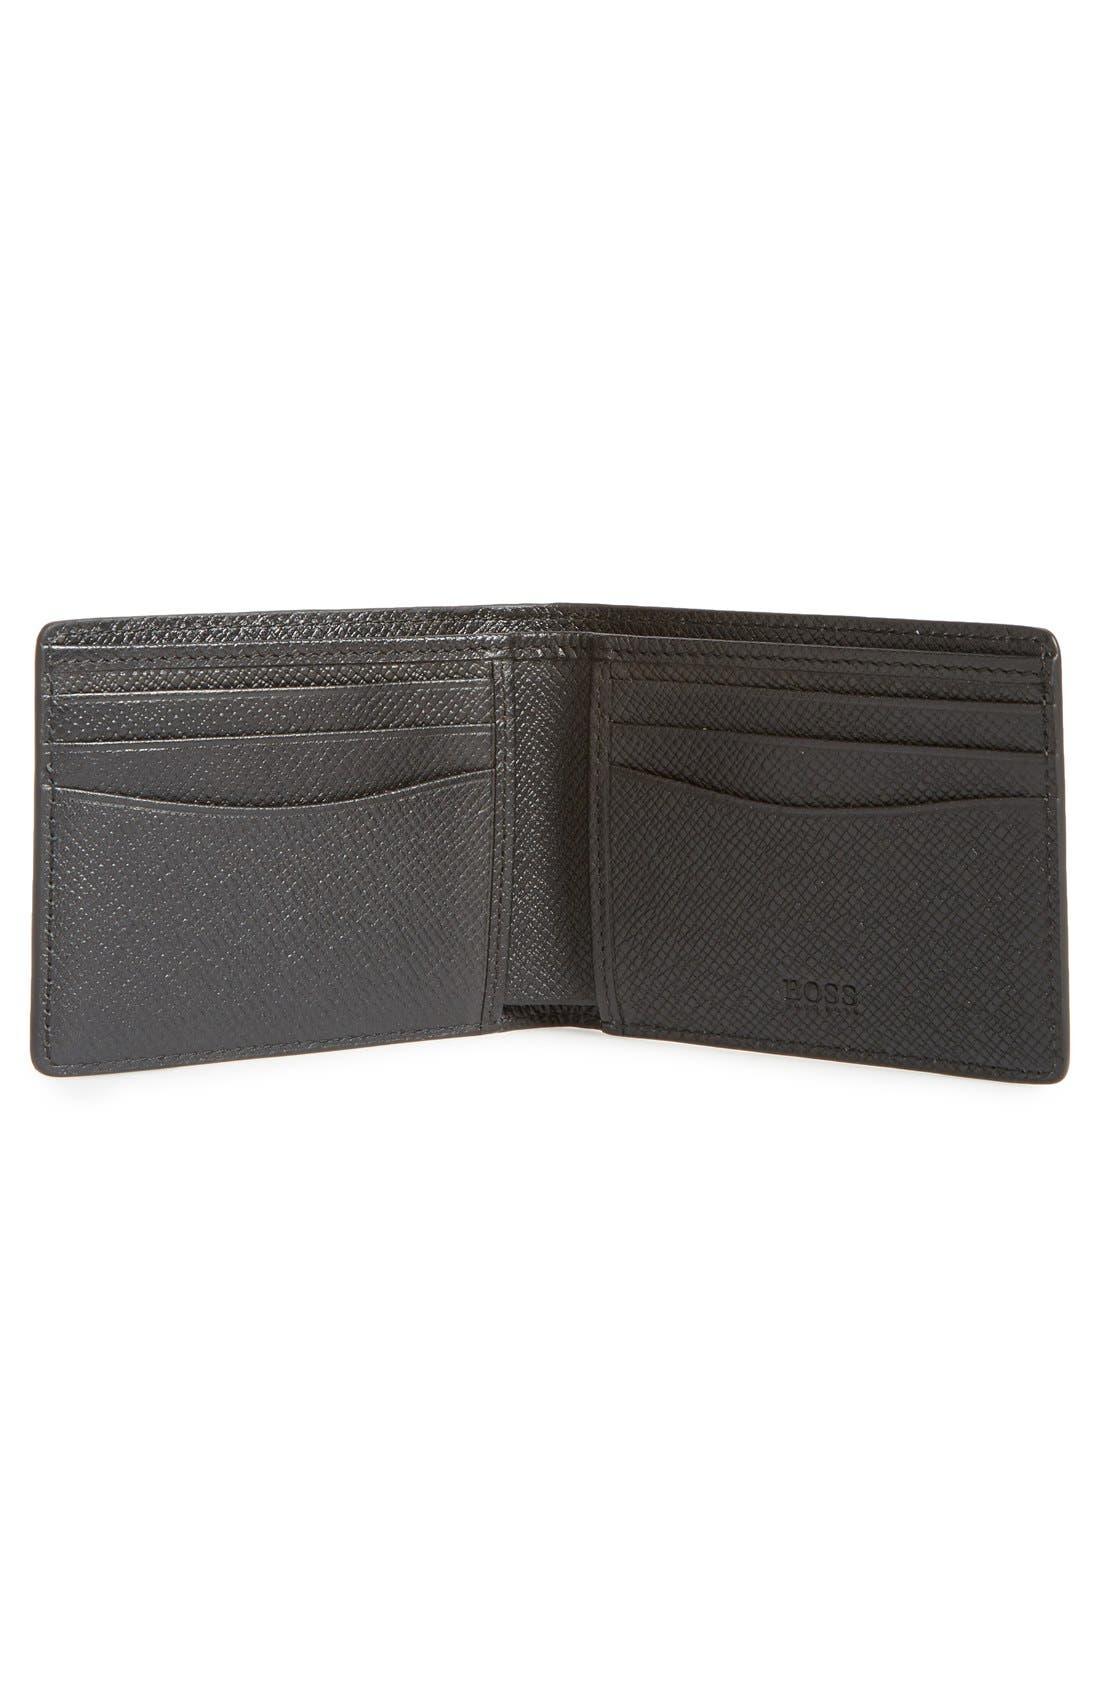 Alternate Image 2  - BOSS 'Signature' Bifold Calfskin Leather Wallet